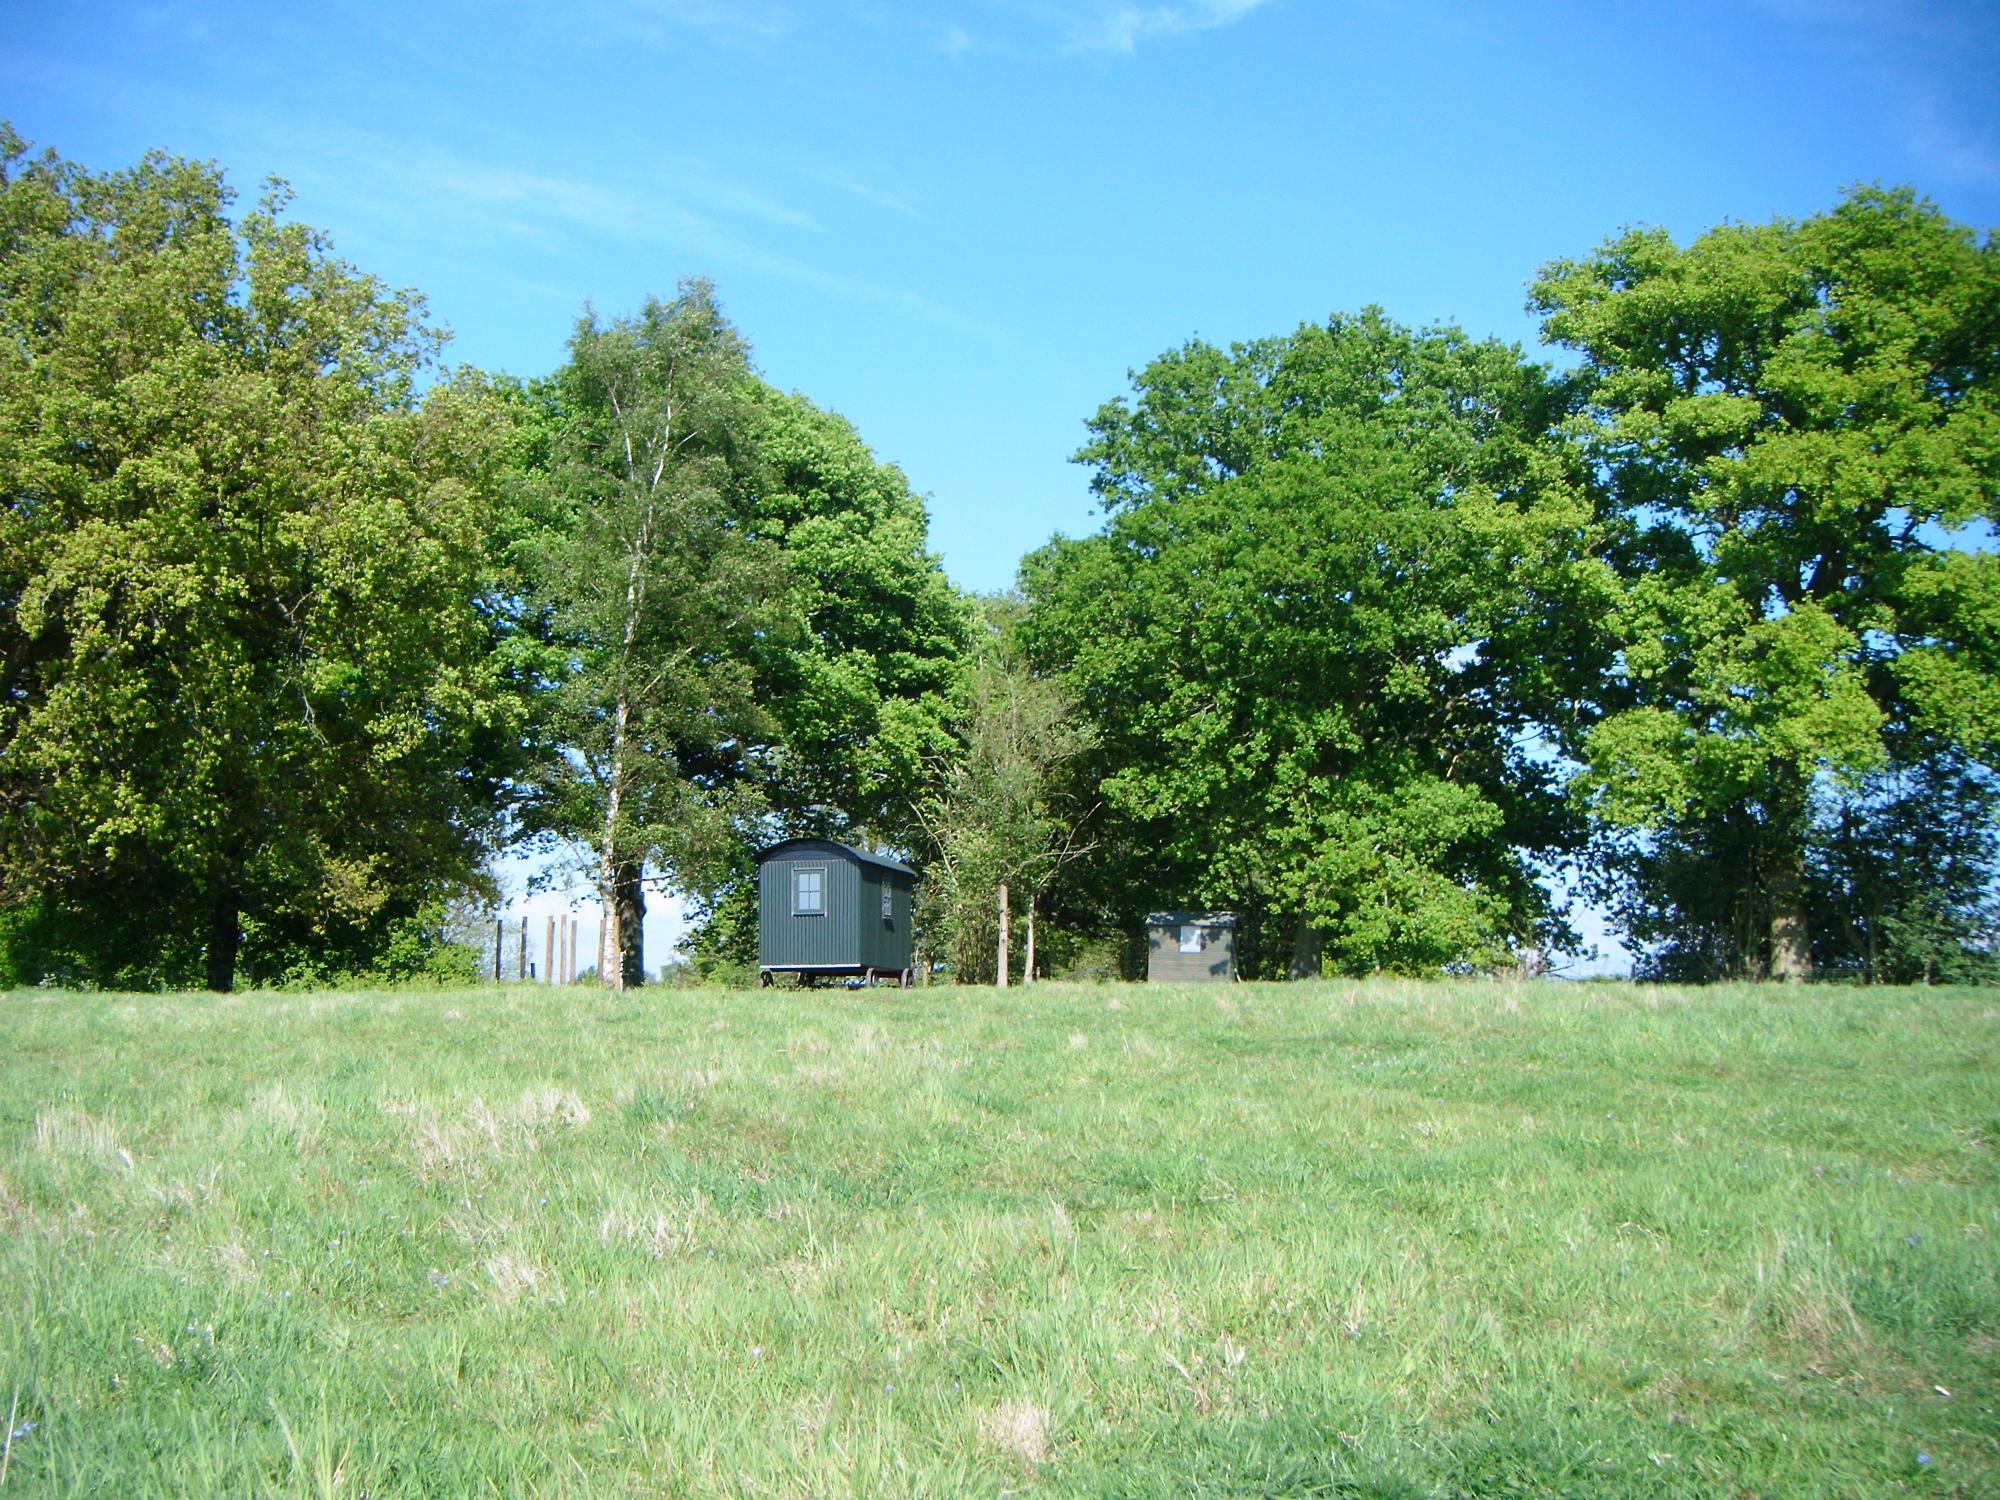 Lockhurst Hatch Farm Glamping